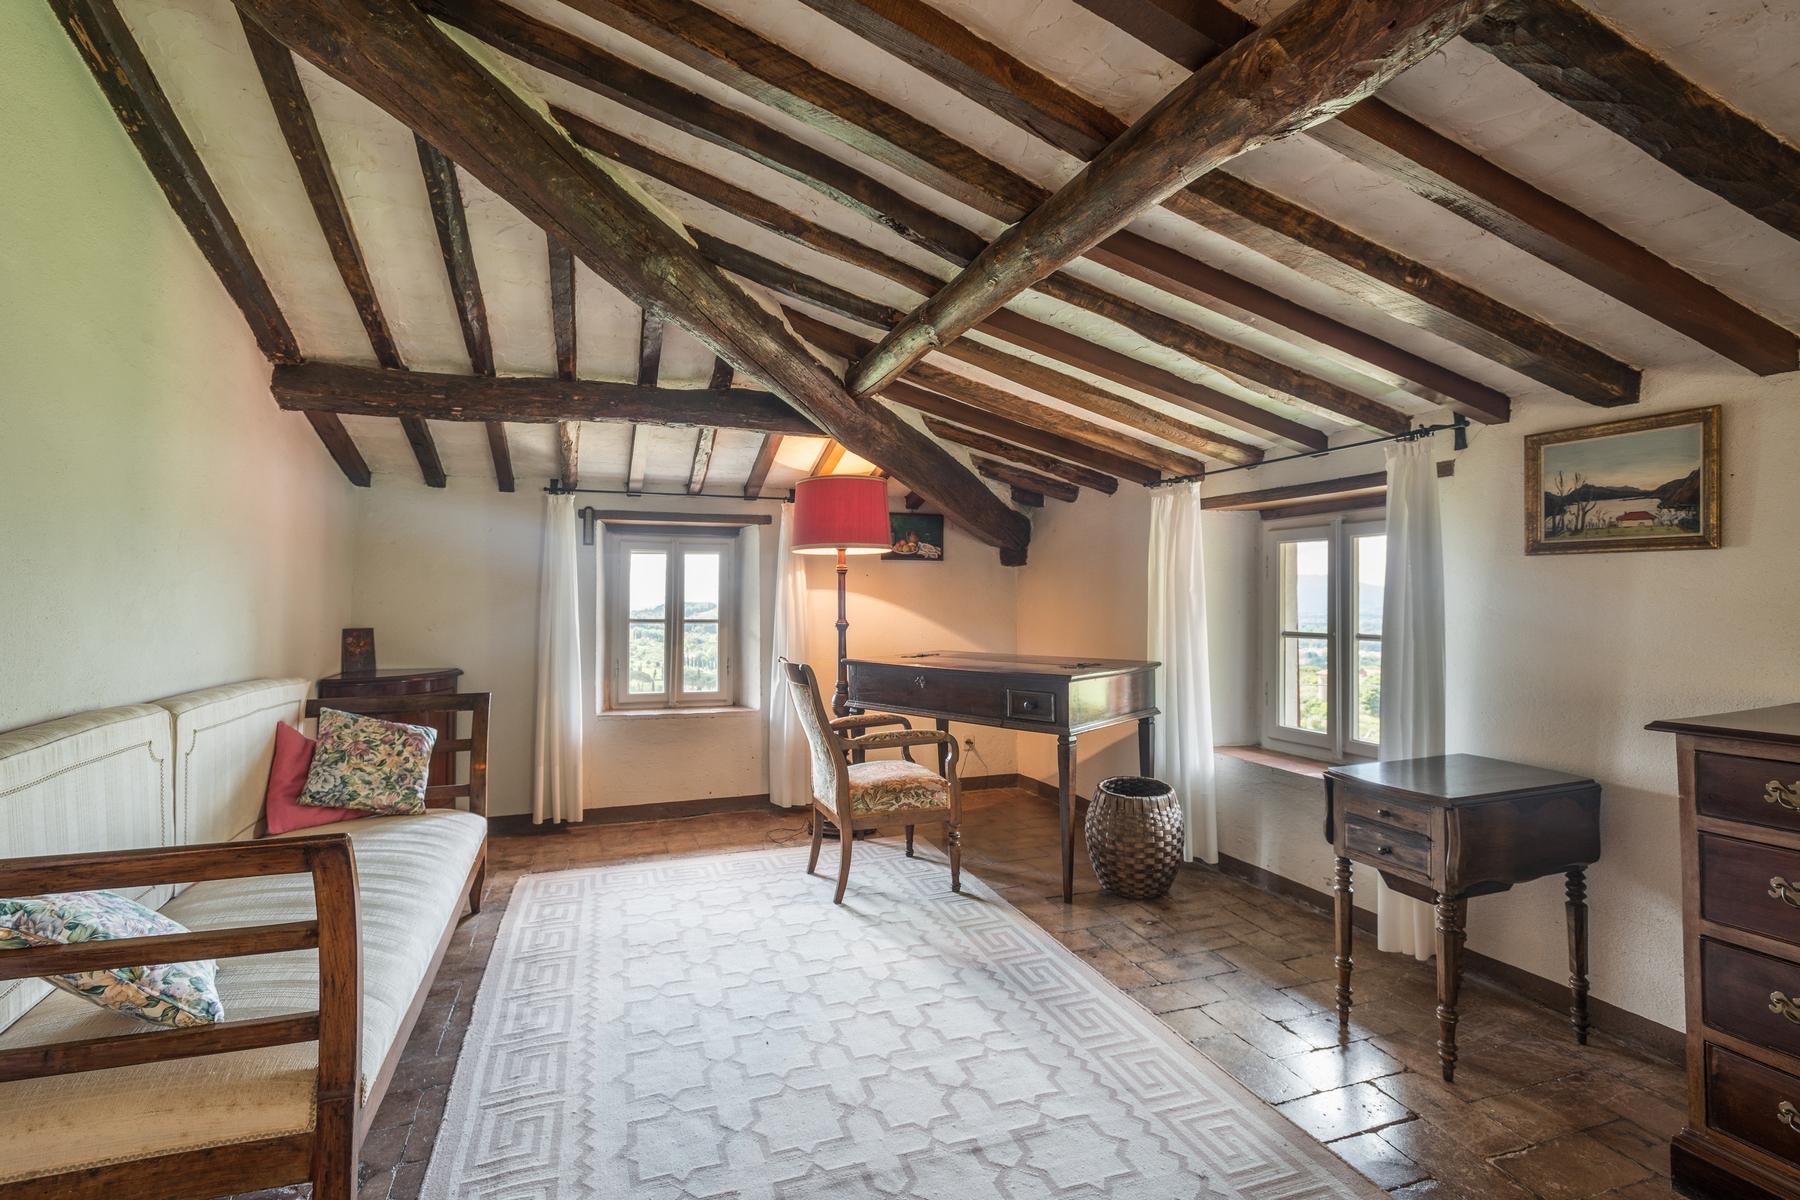 Villa in Vendita a Lucca: 5 locali, 550 mq - Foto 11